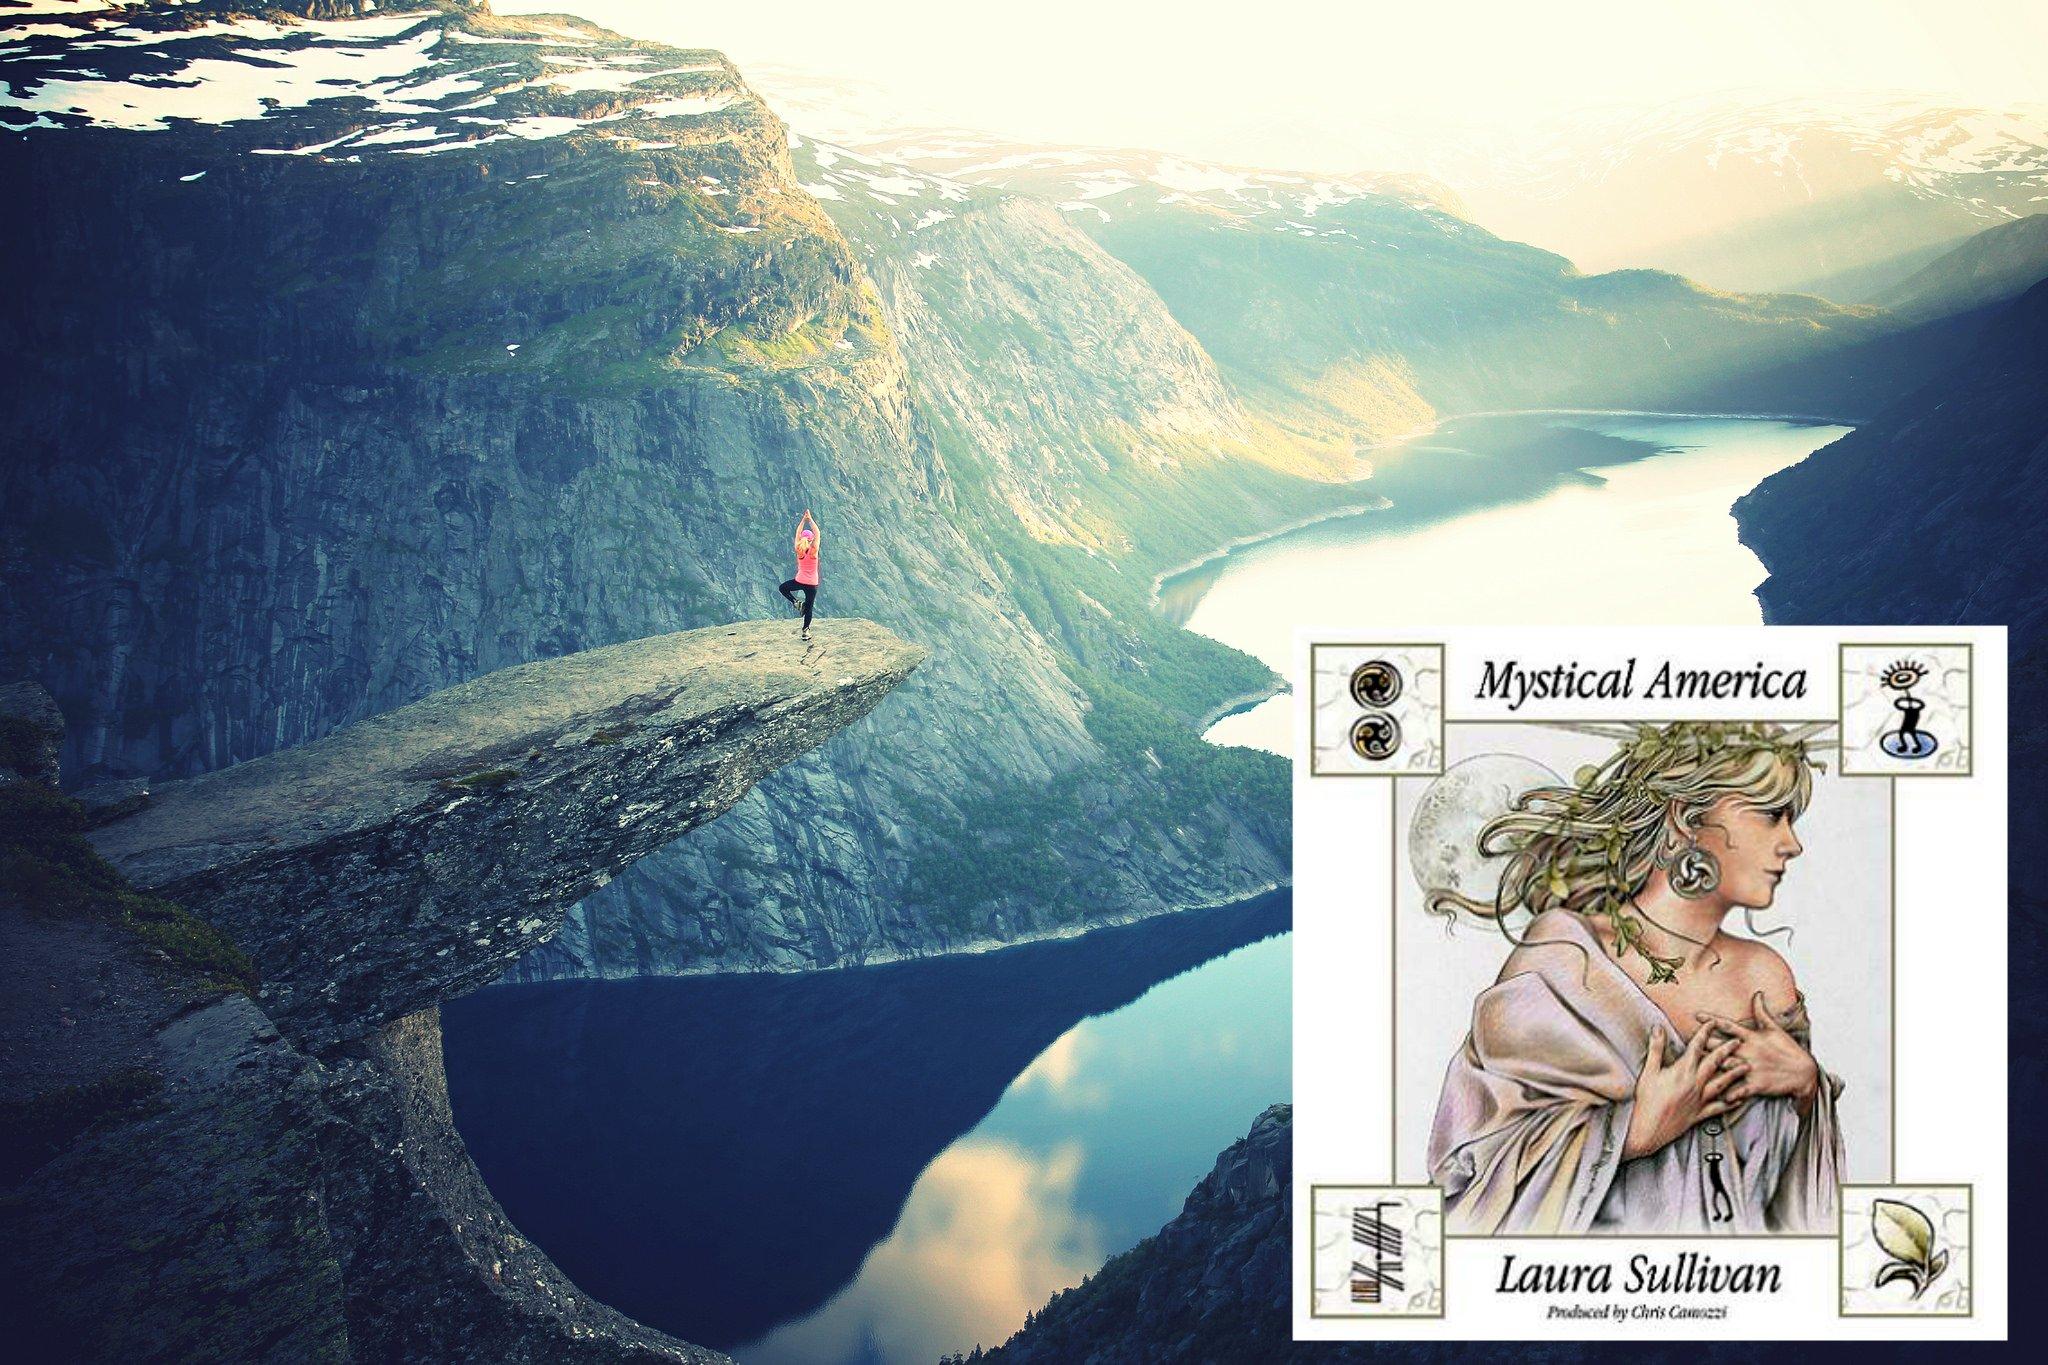 Mystical America: Relaxing Piano Music, Spa Music, Calming